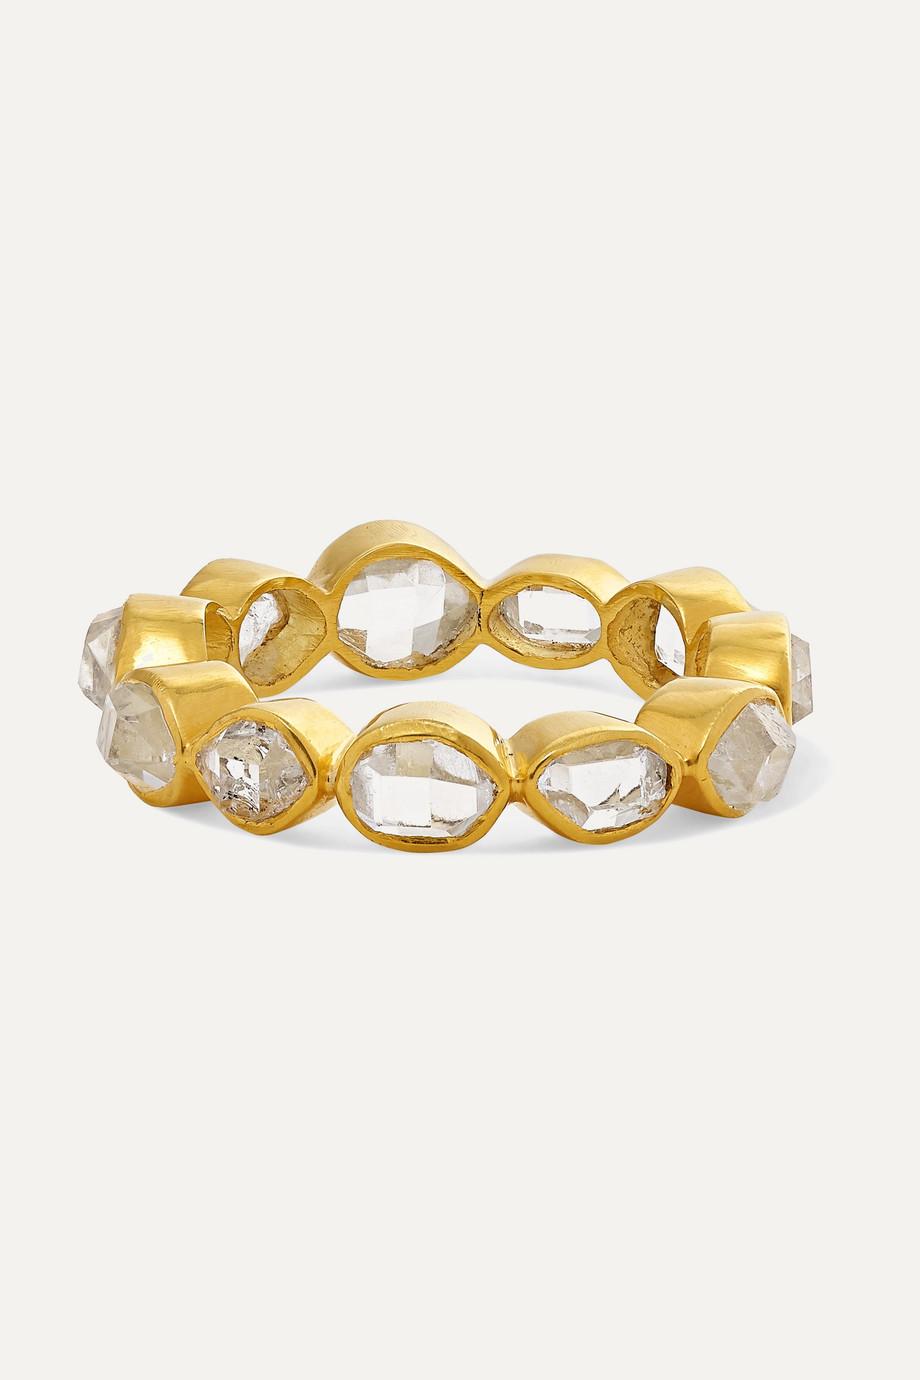 Pippa Small Crystallinity 18-karat gold Herkimer diamond ring